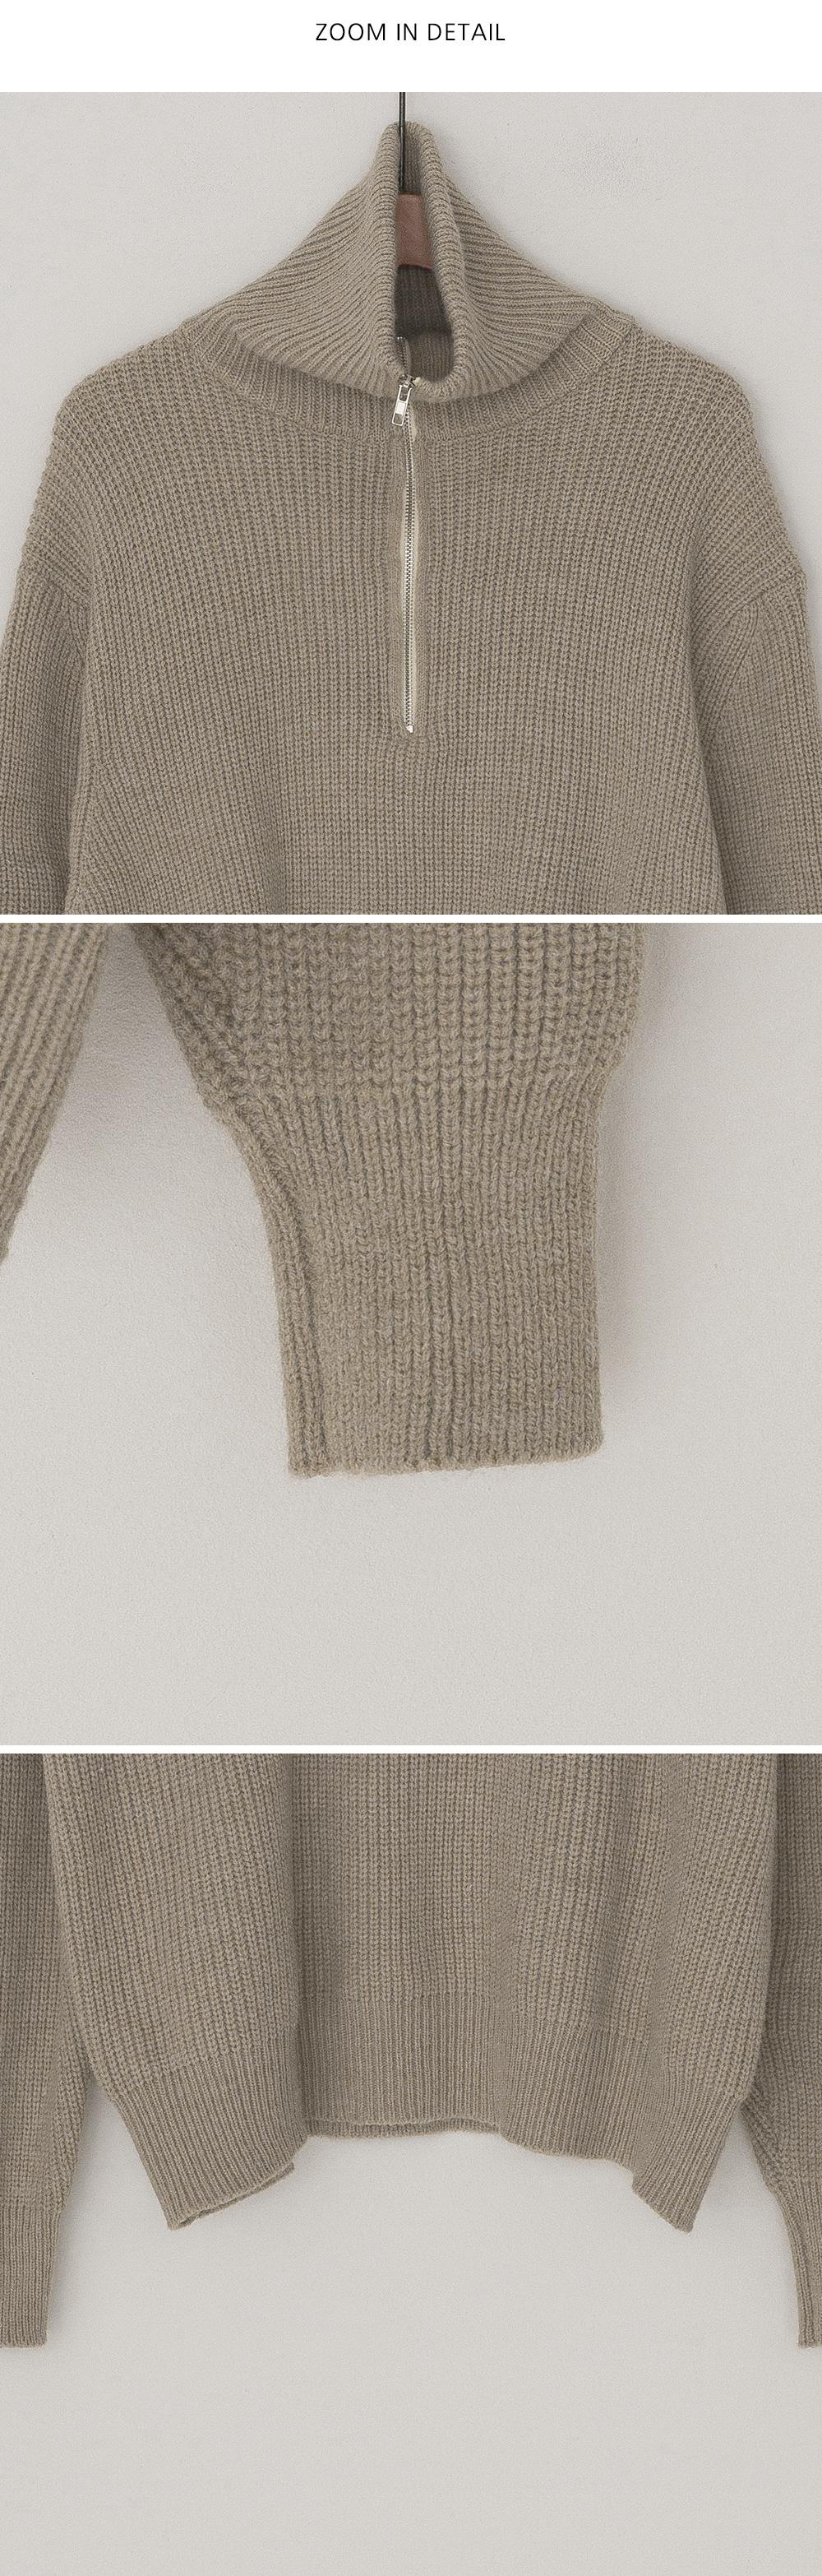 Need Half Zip Up High Neck Knit